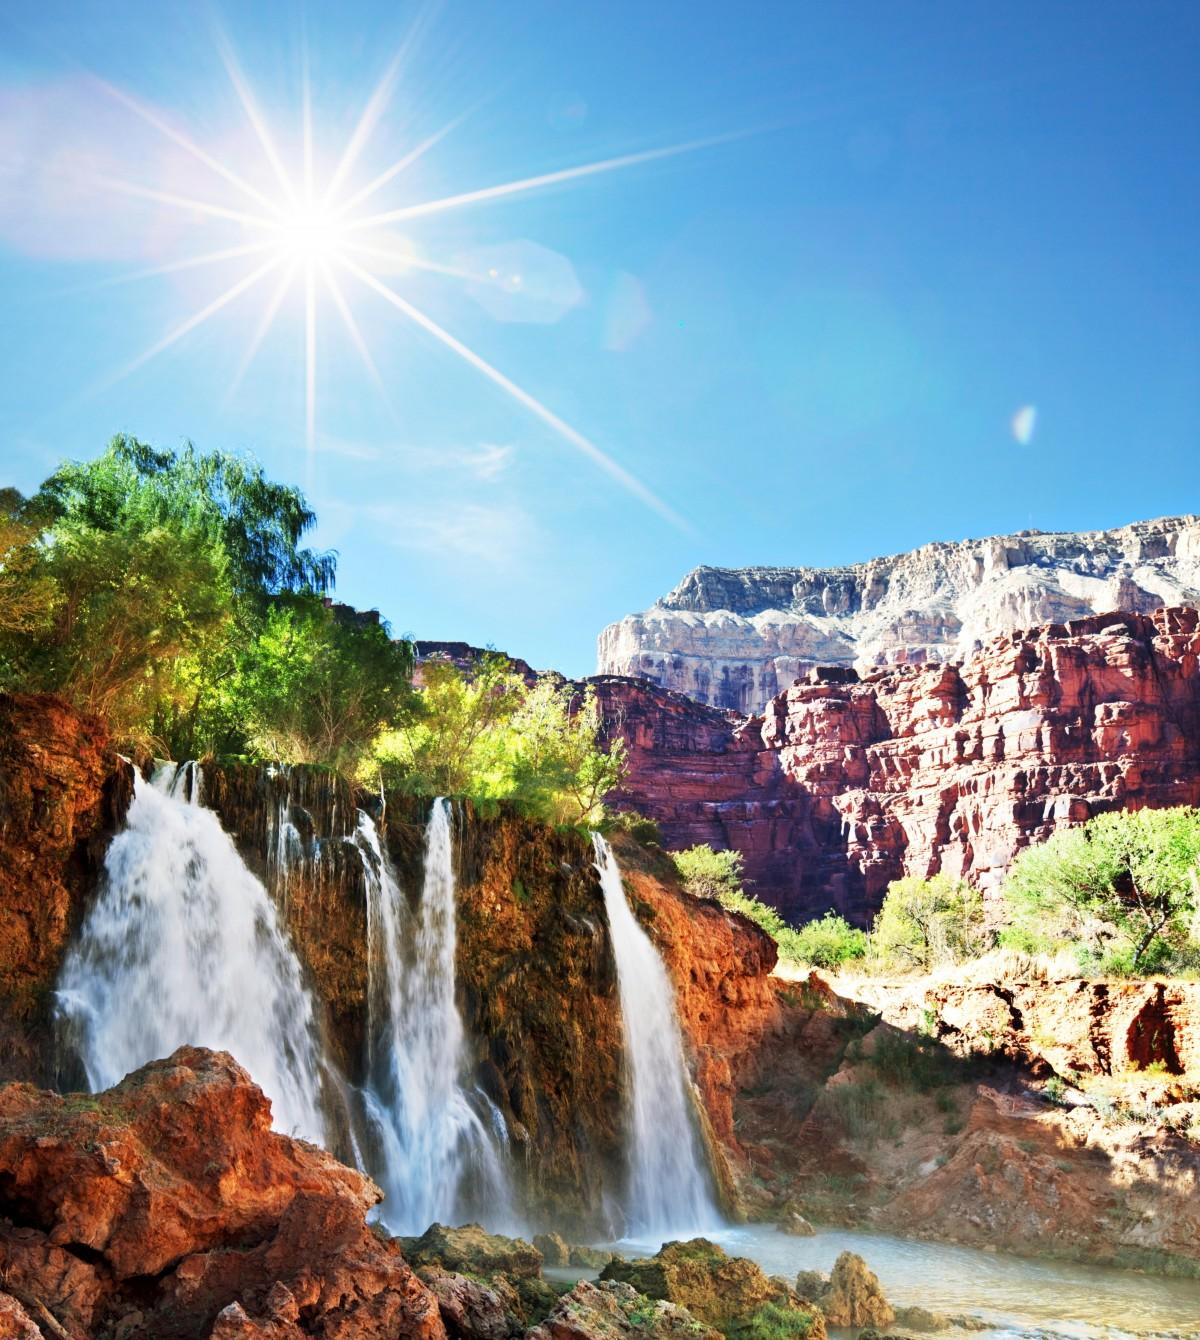 Beautiful Nature House: Free Images : Landscape, Sea, Coast, Waterfall, Mountain